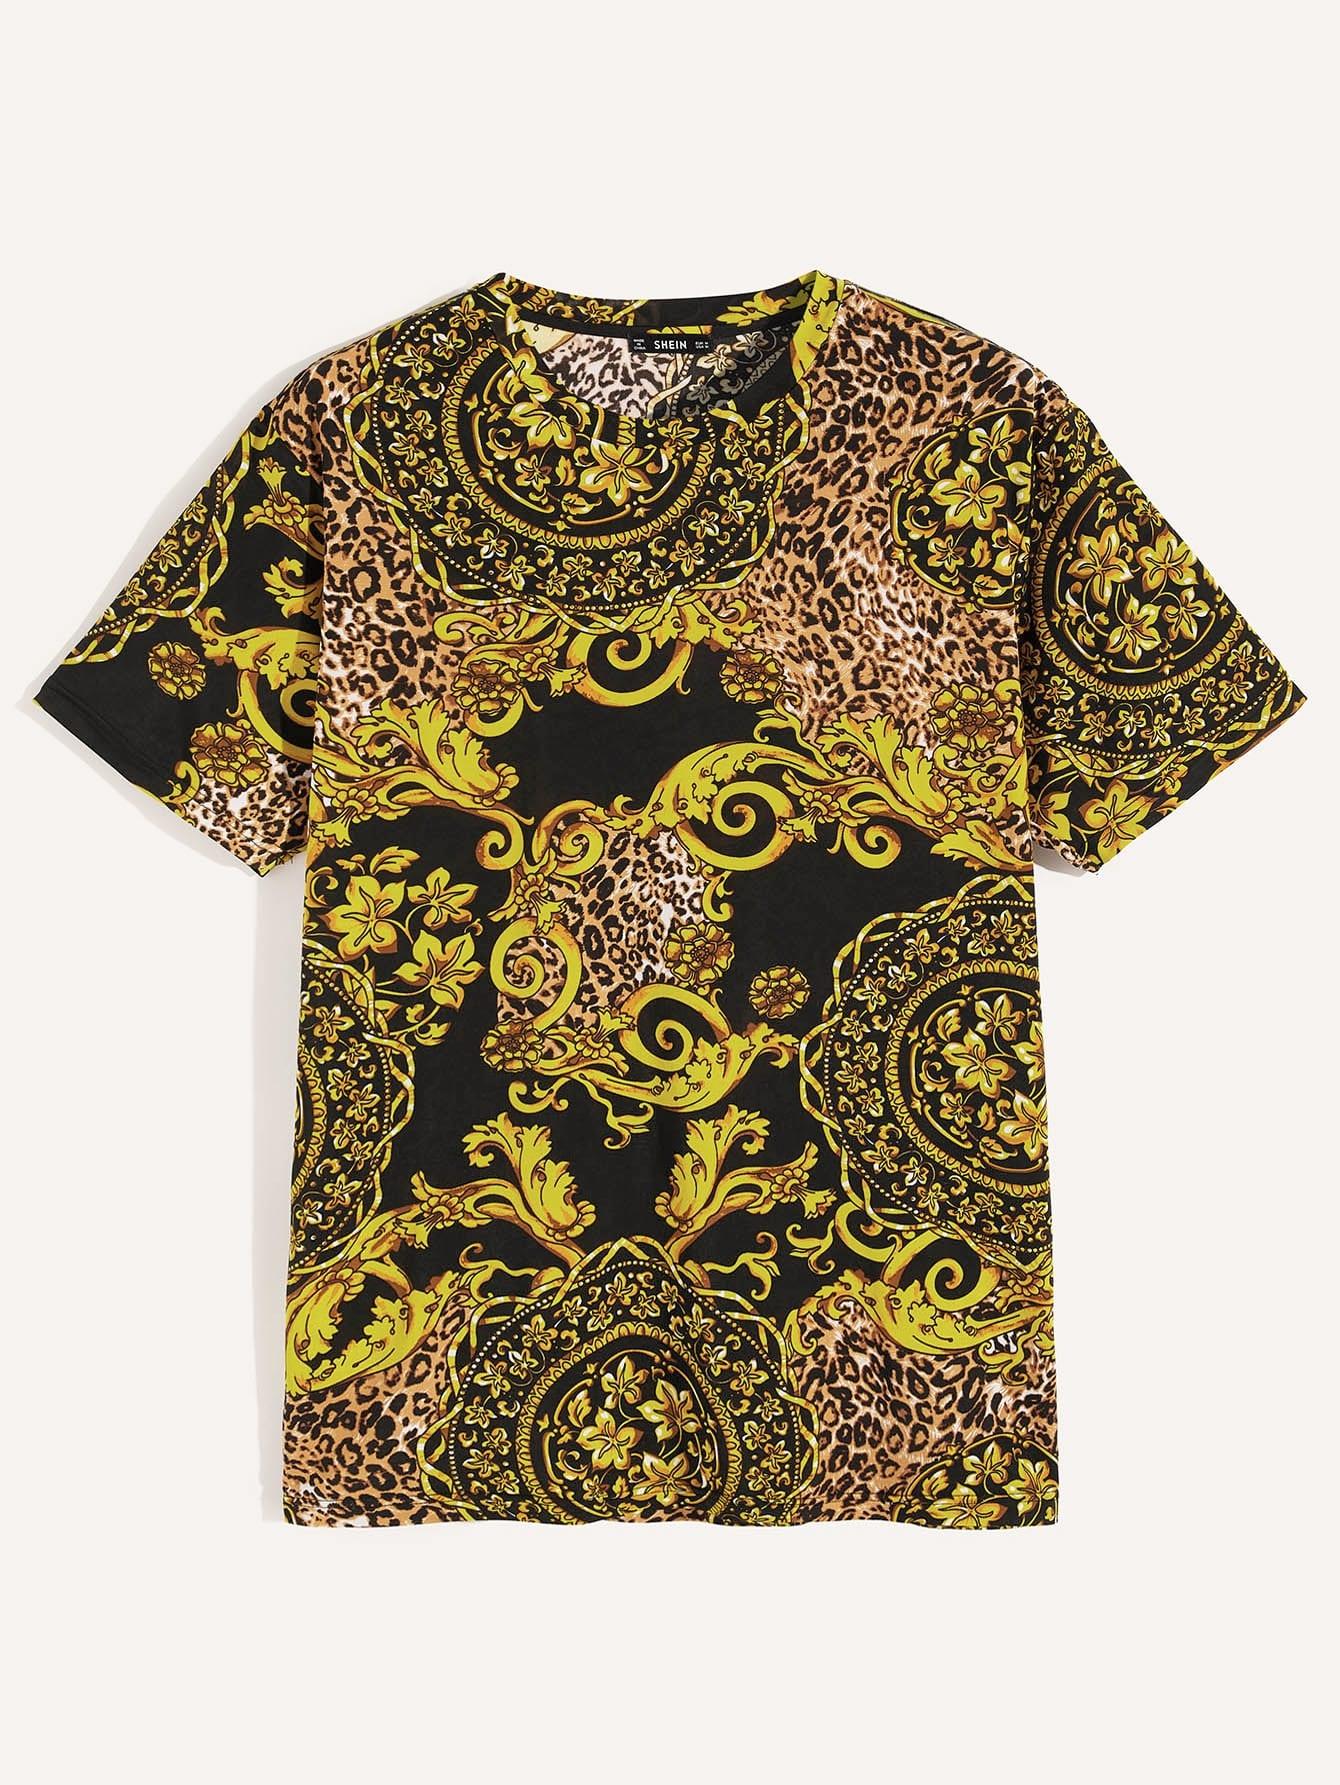 Купить Мужская футболка Scroll & Leopard, null, SheIn